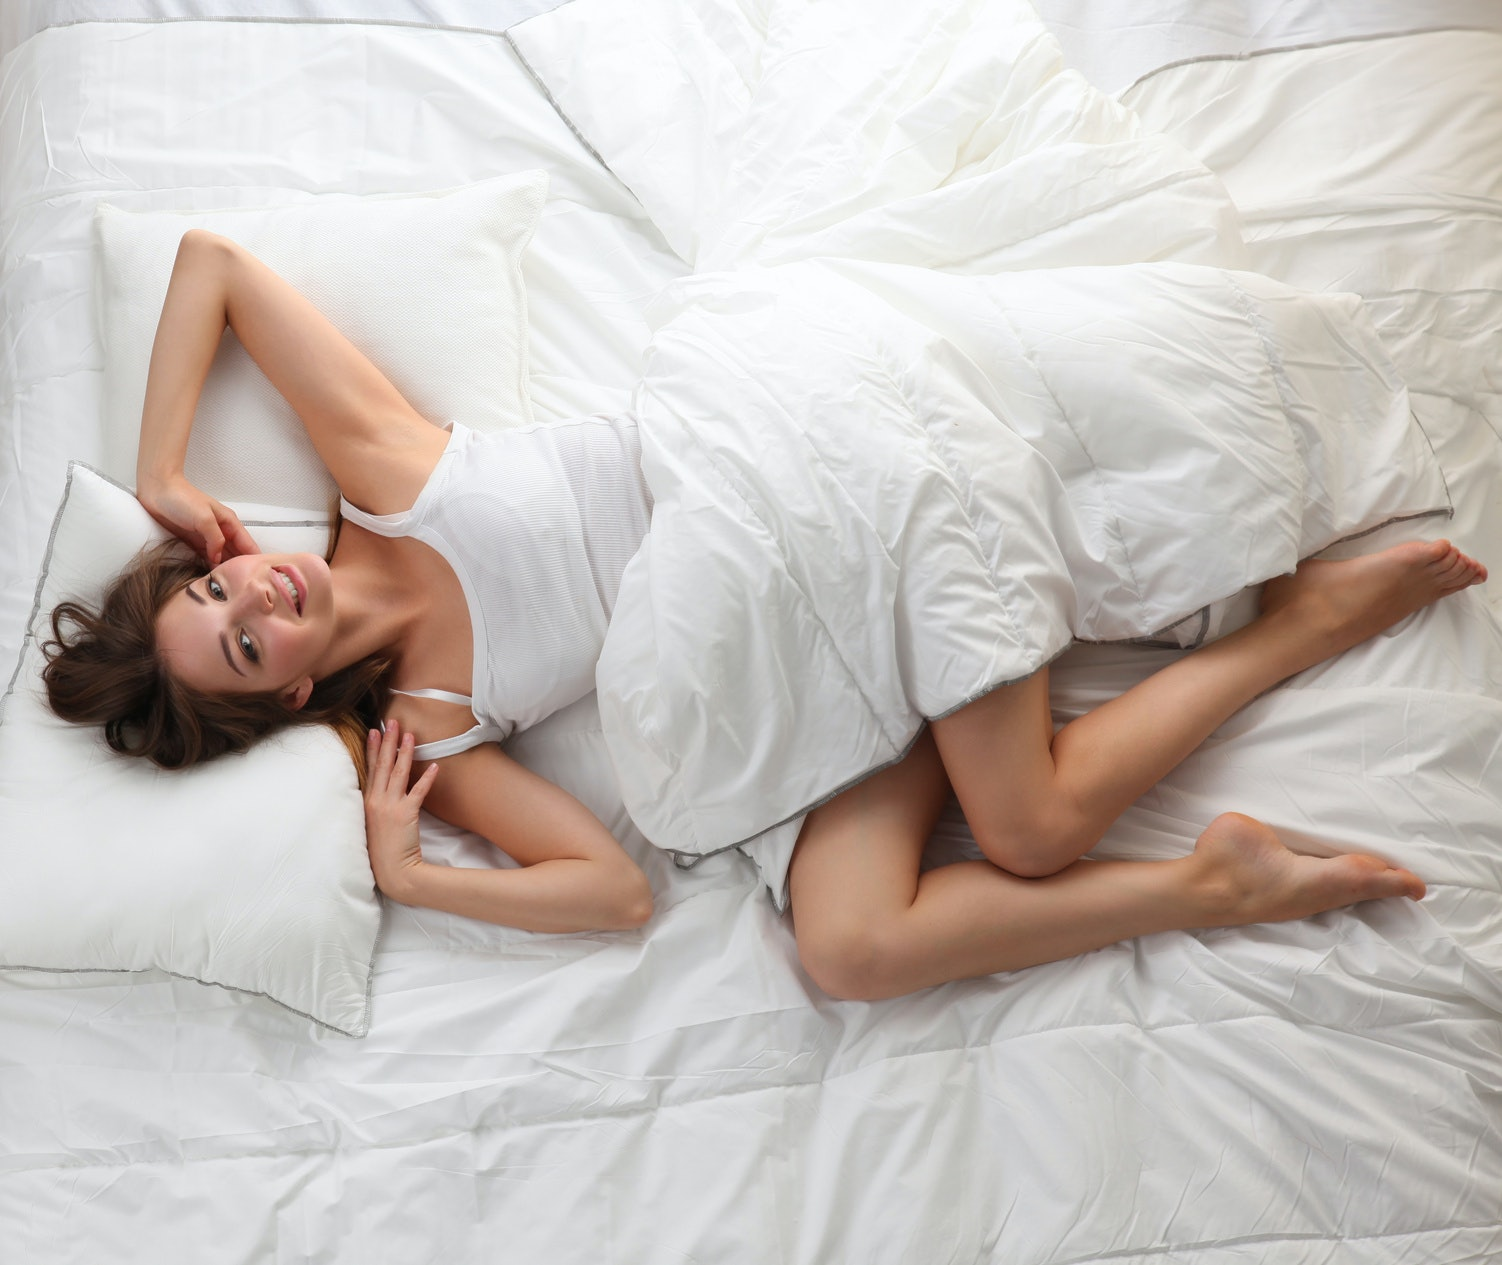 Women tease while men masturbate